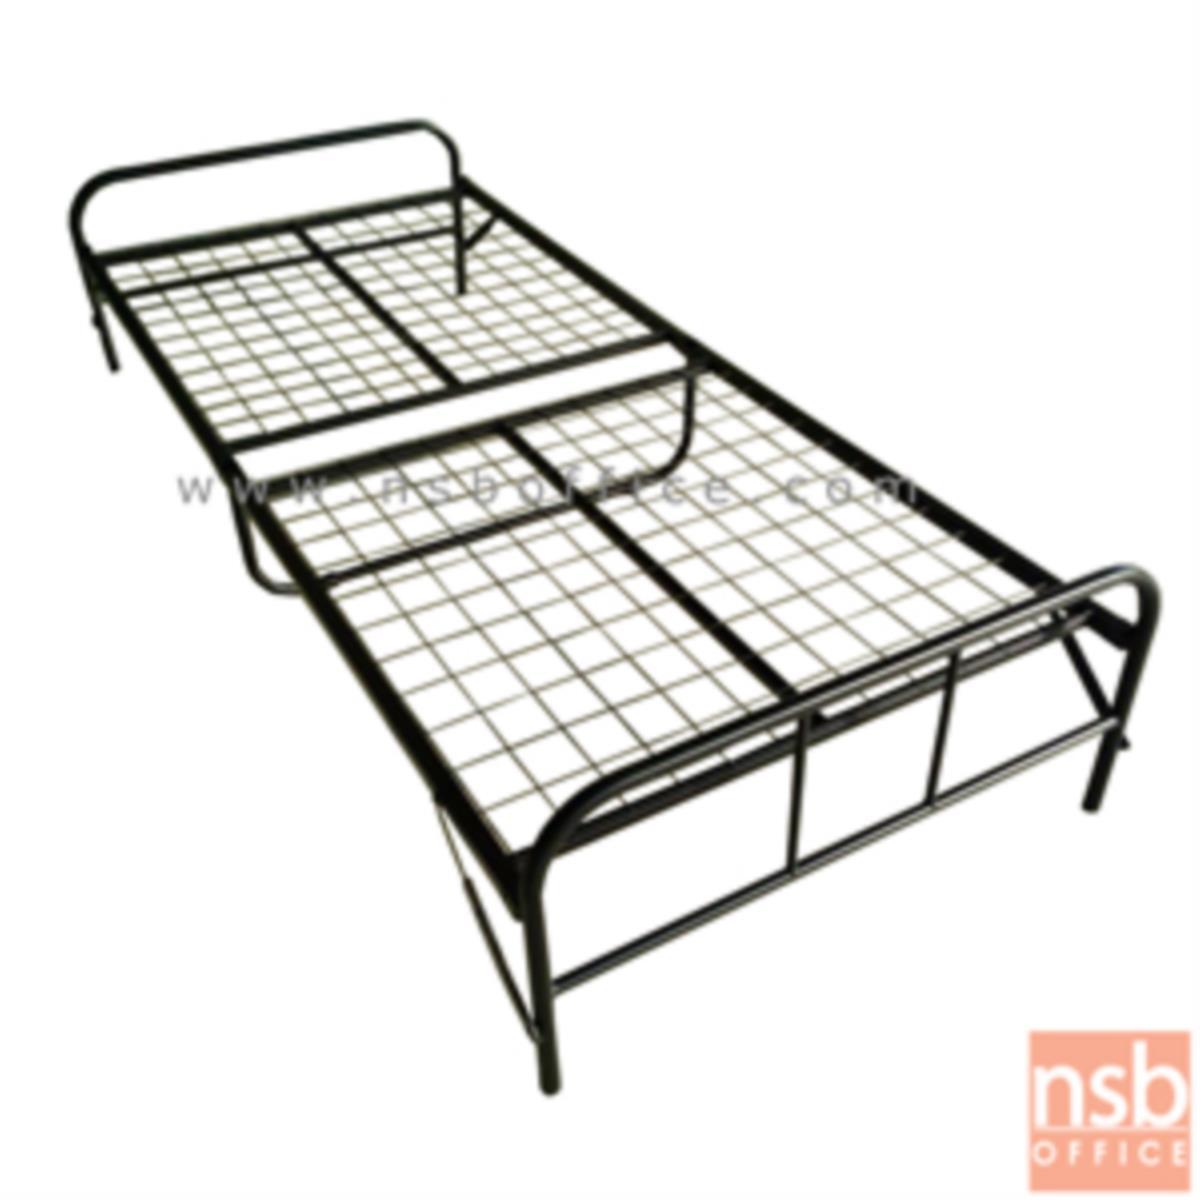 G11A018:เตียงเหล็กพับได้ พื้นตะแกรง  ขนาด 90W*200D* 29H cm